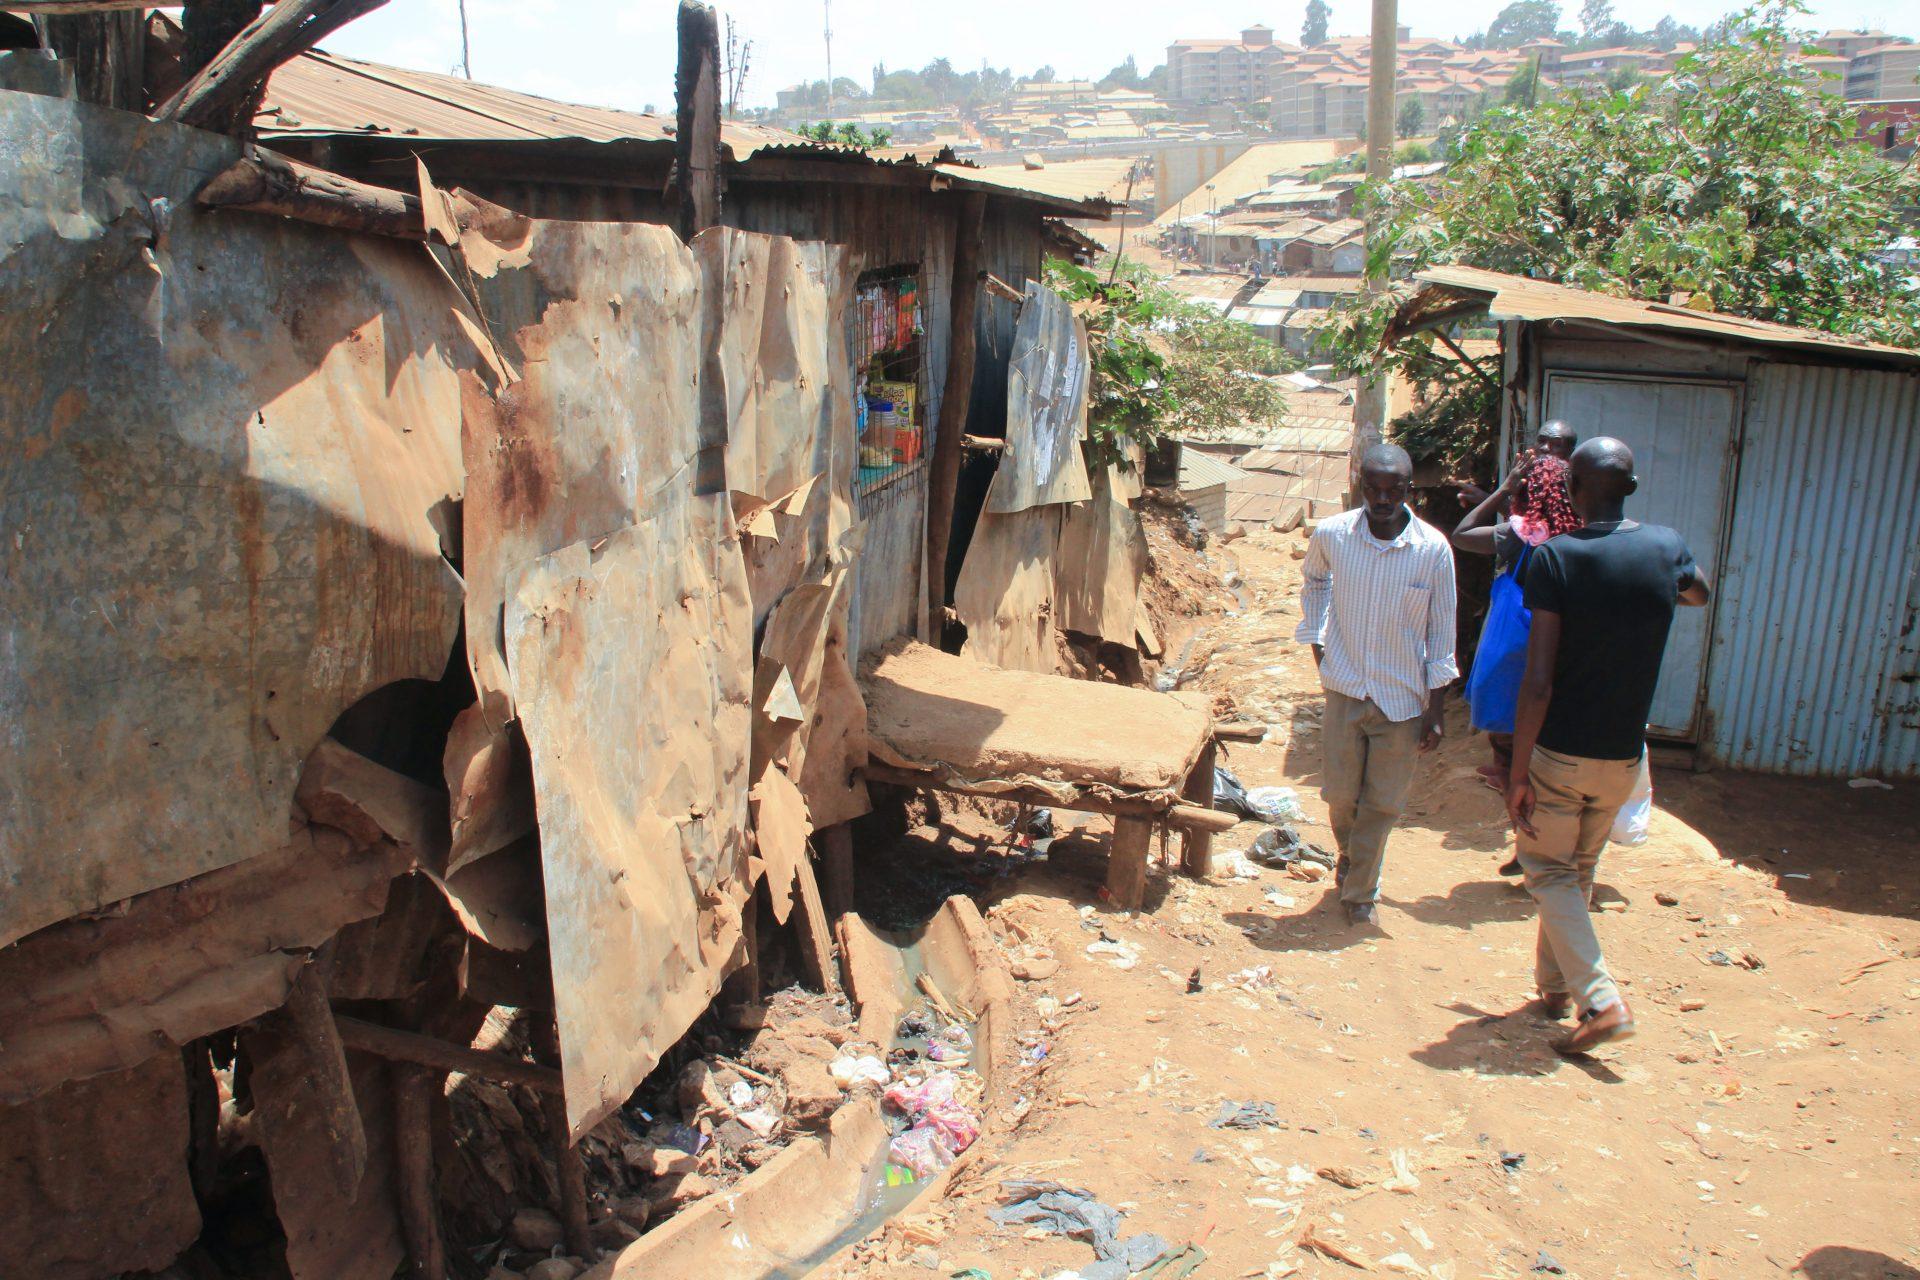 Kibera, Nairobi, Kenya - February 13, 2015: a street in slums with poor huts